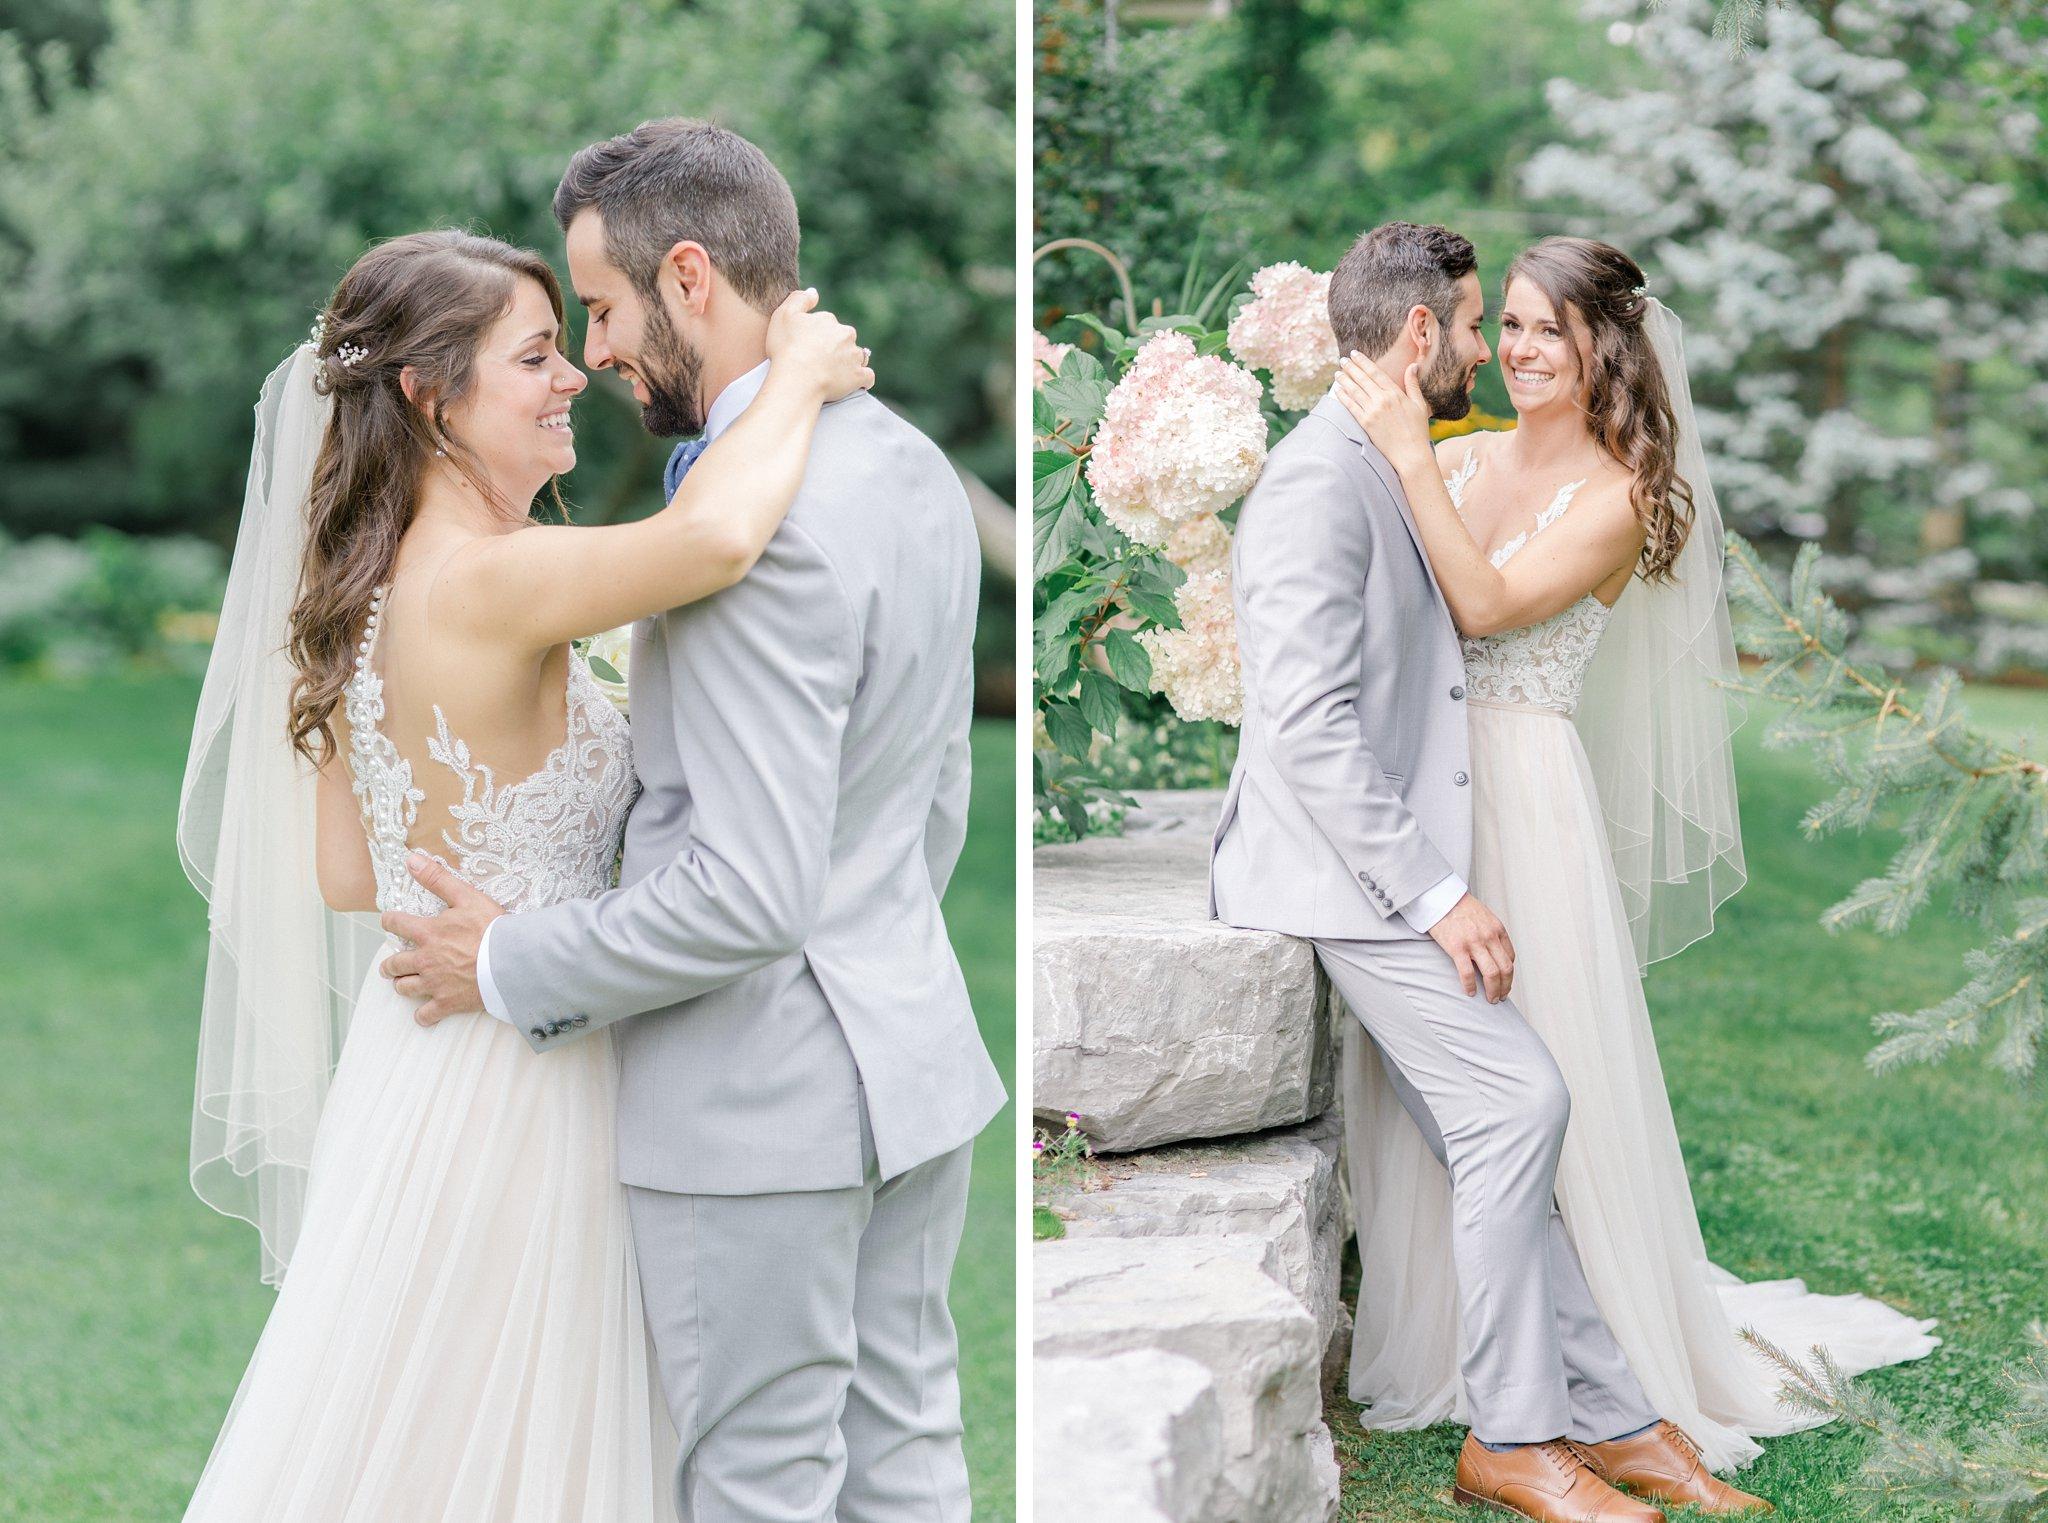 Bride and groom photos in Navan Outdoor wedding at Cumberland Heritage Museum Amy Pinder Photography